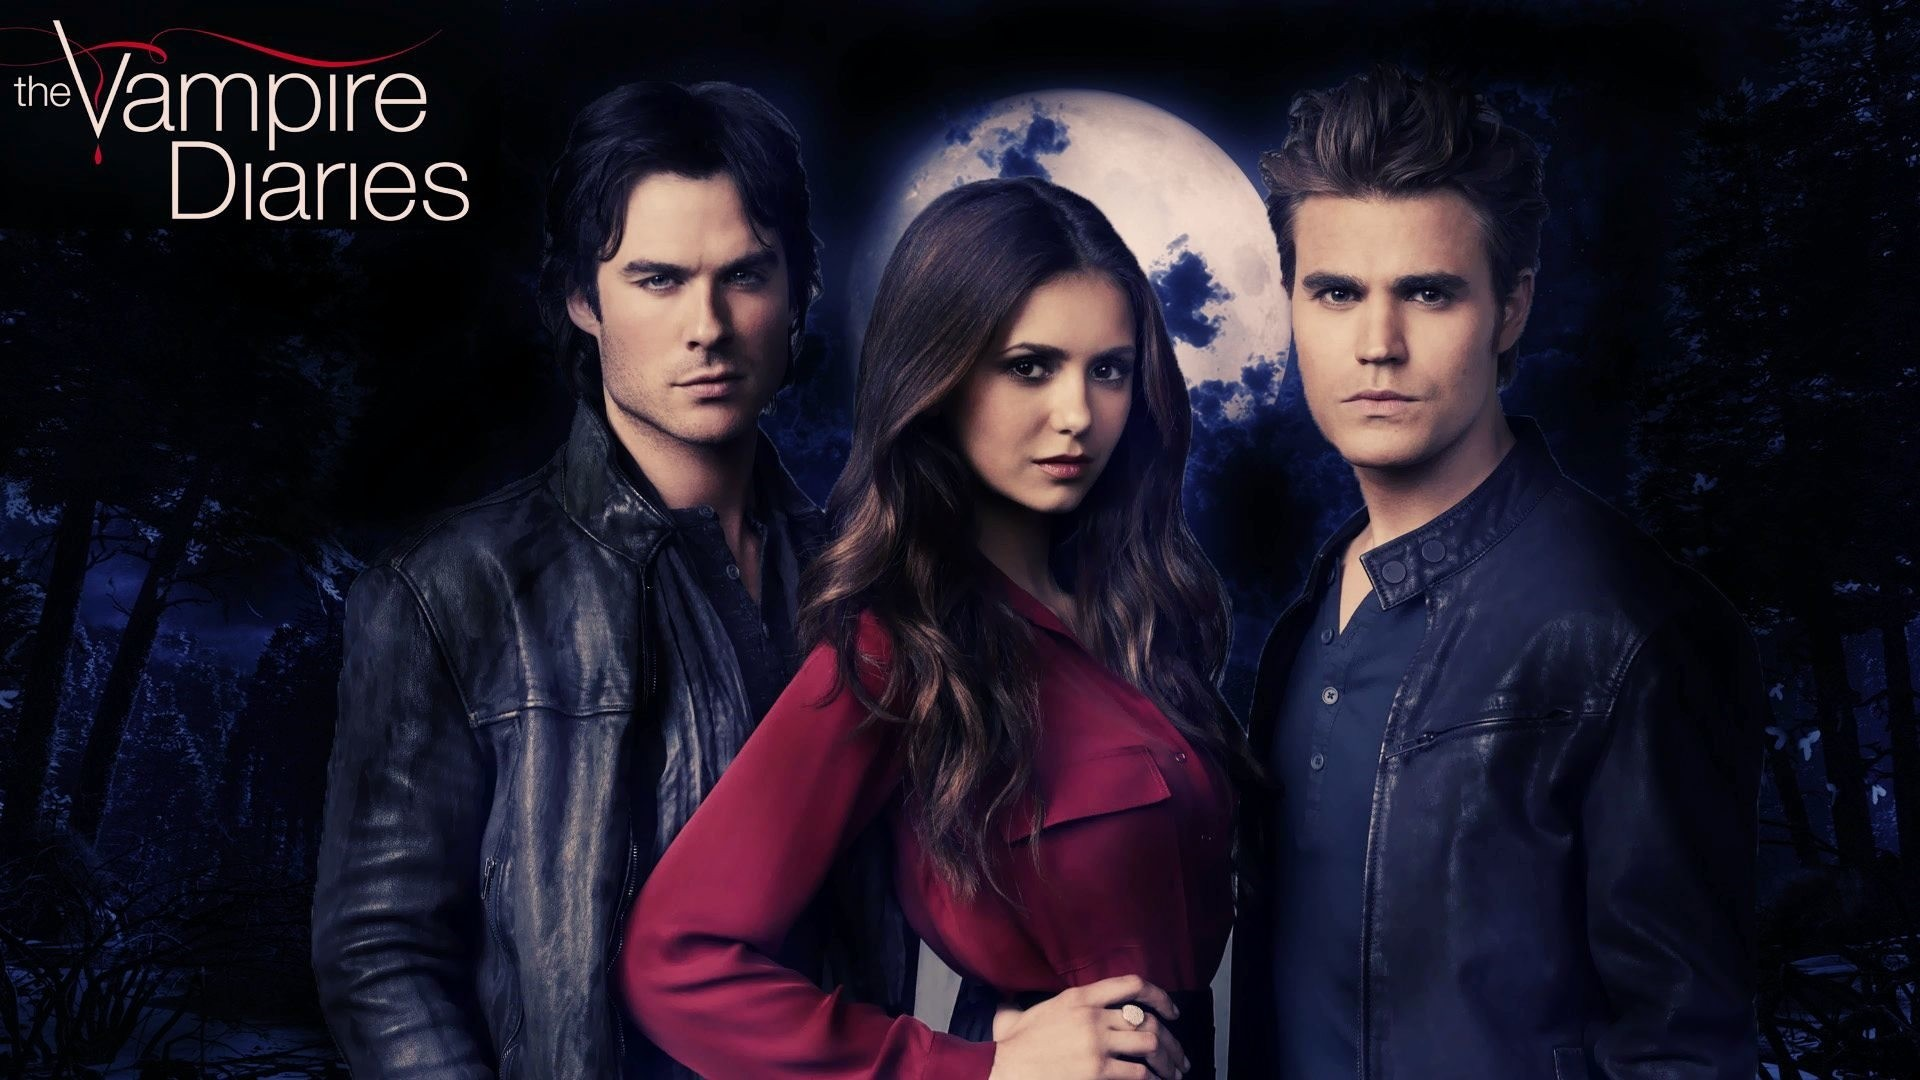 Vampire Diaries Background Wallpaper